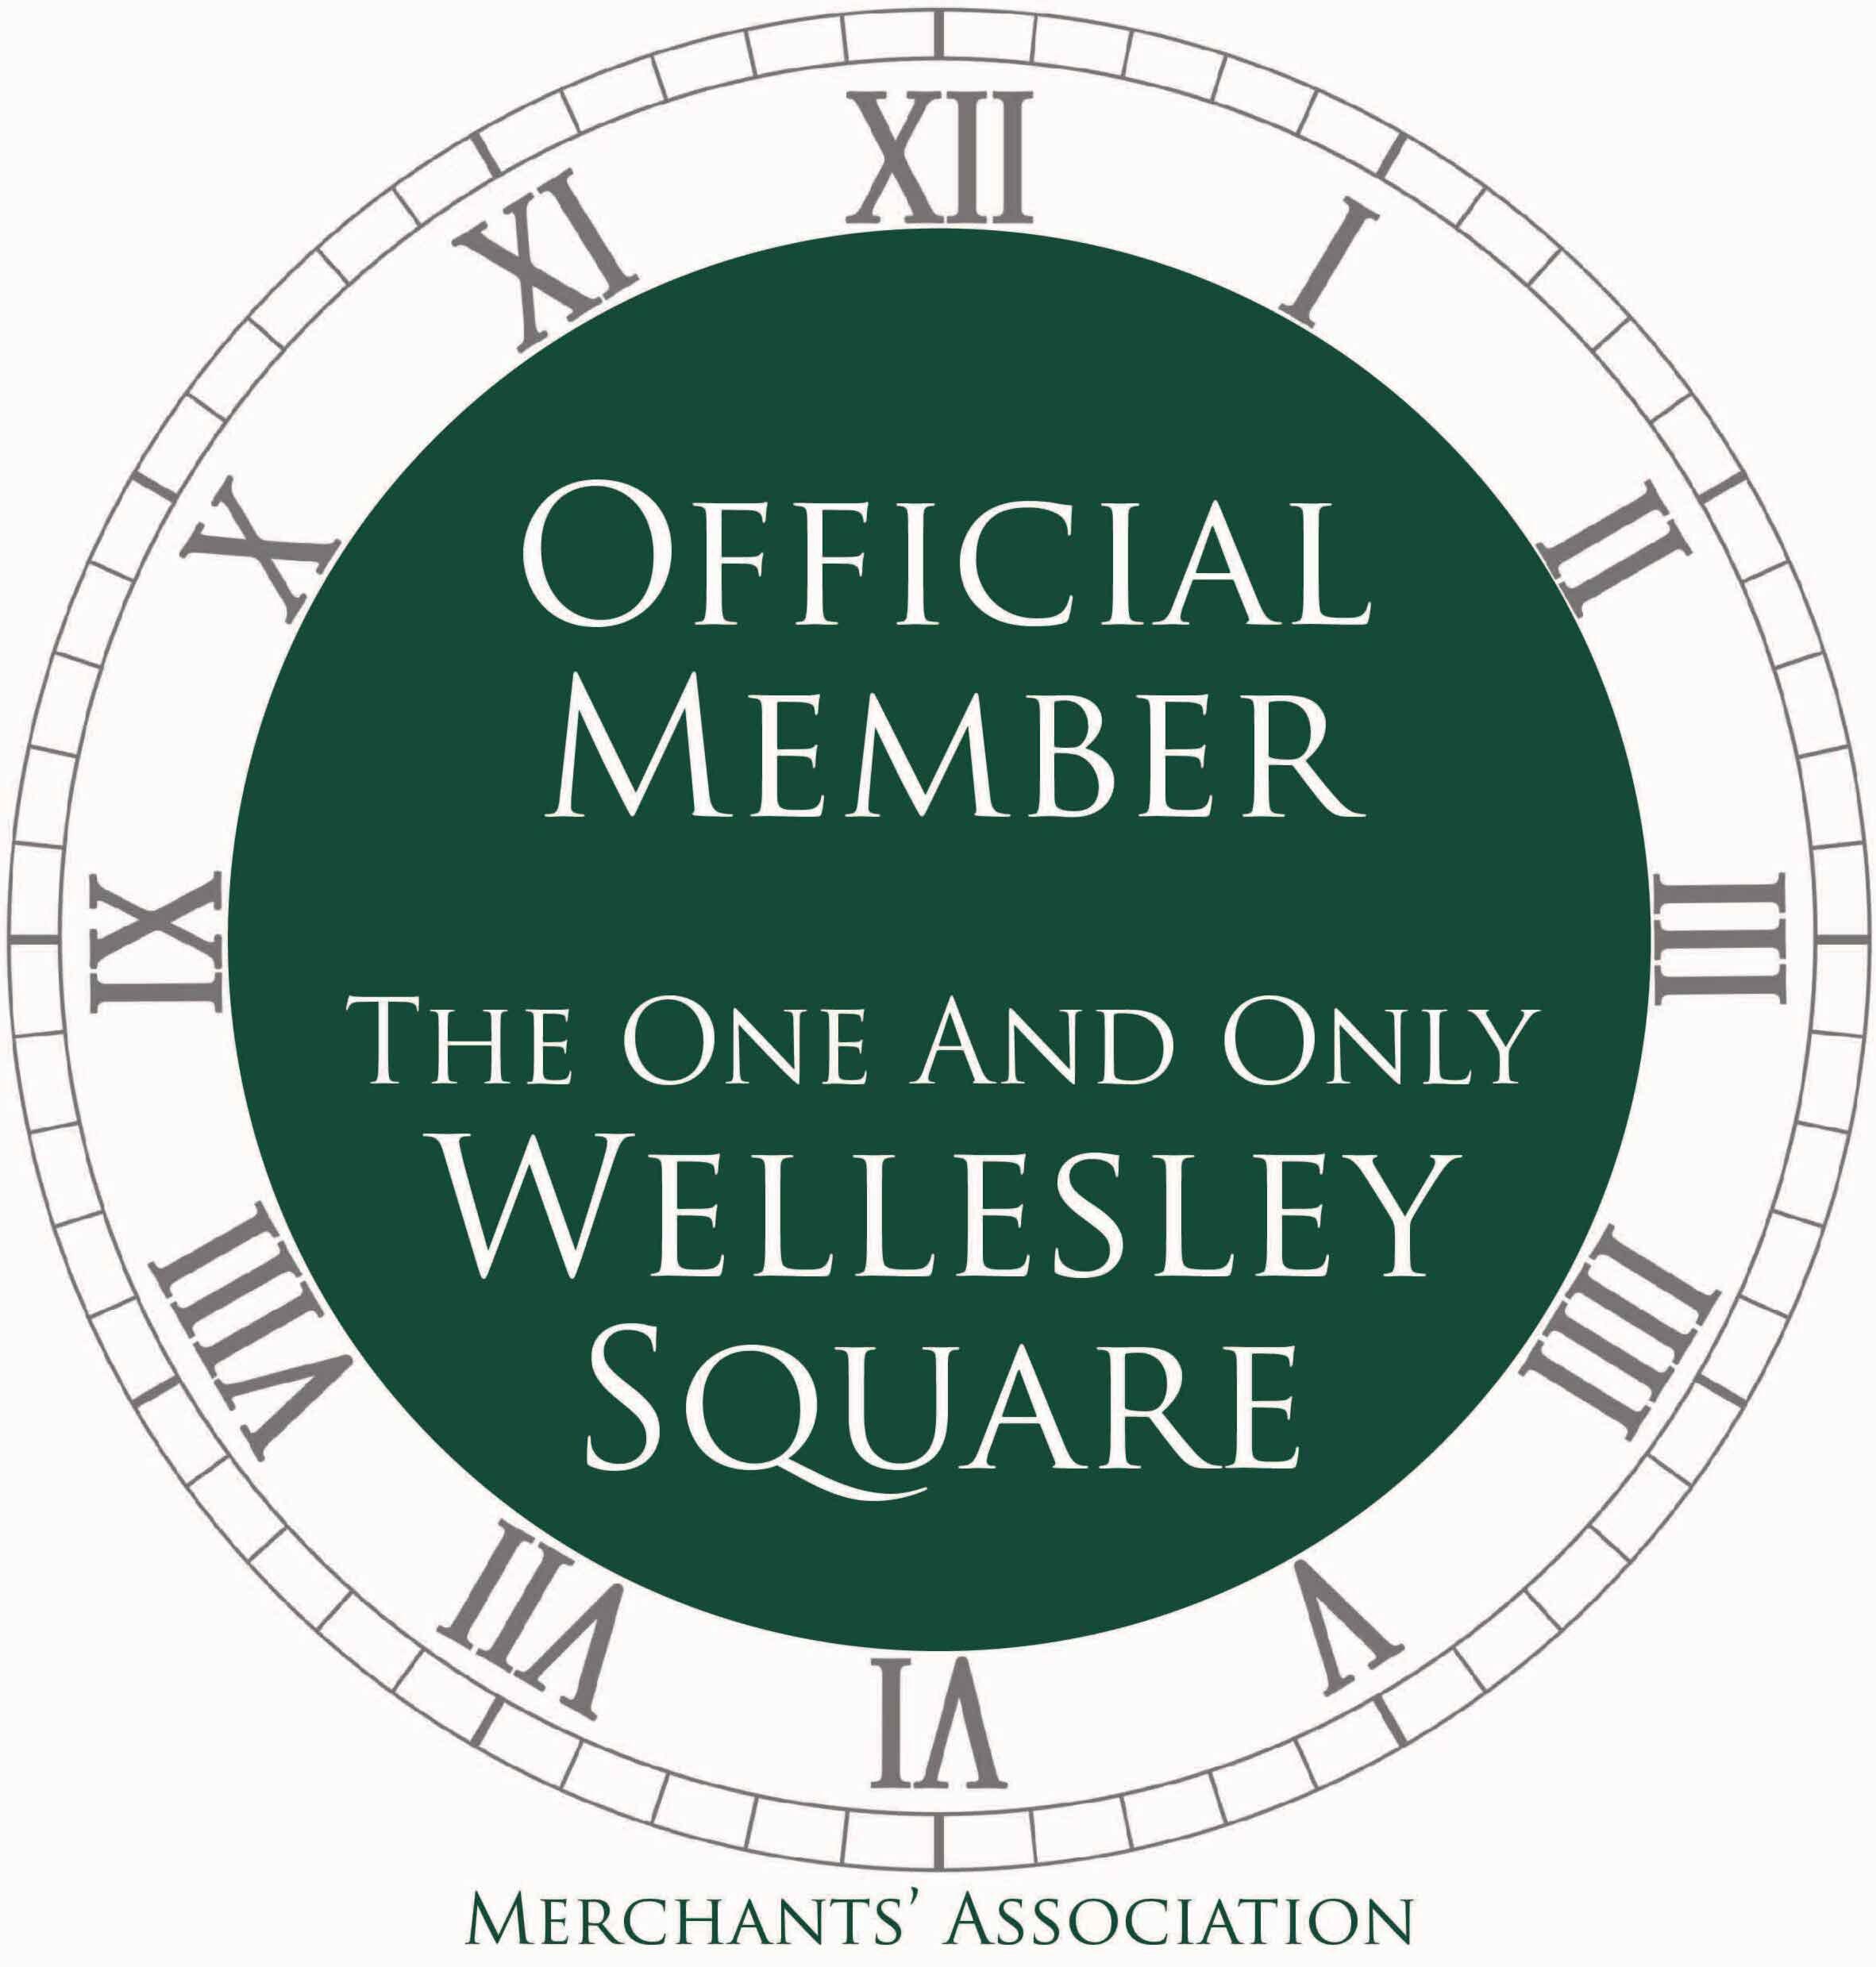 ws-official-mem-insignia-j1.jpg